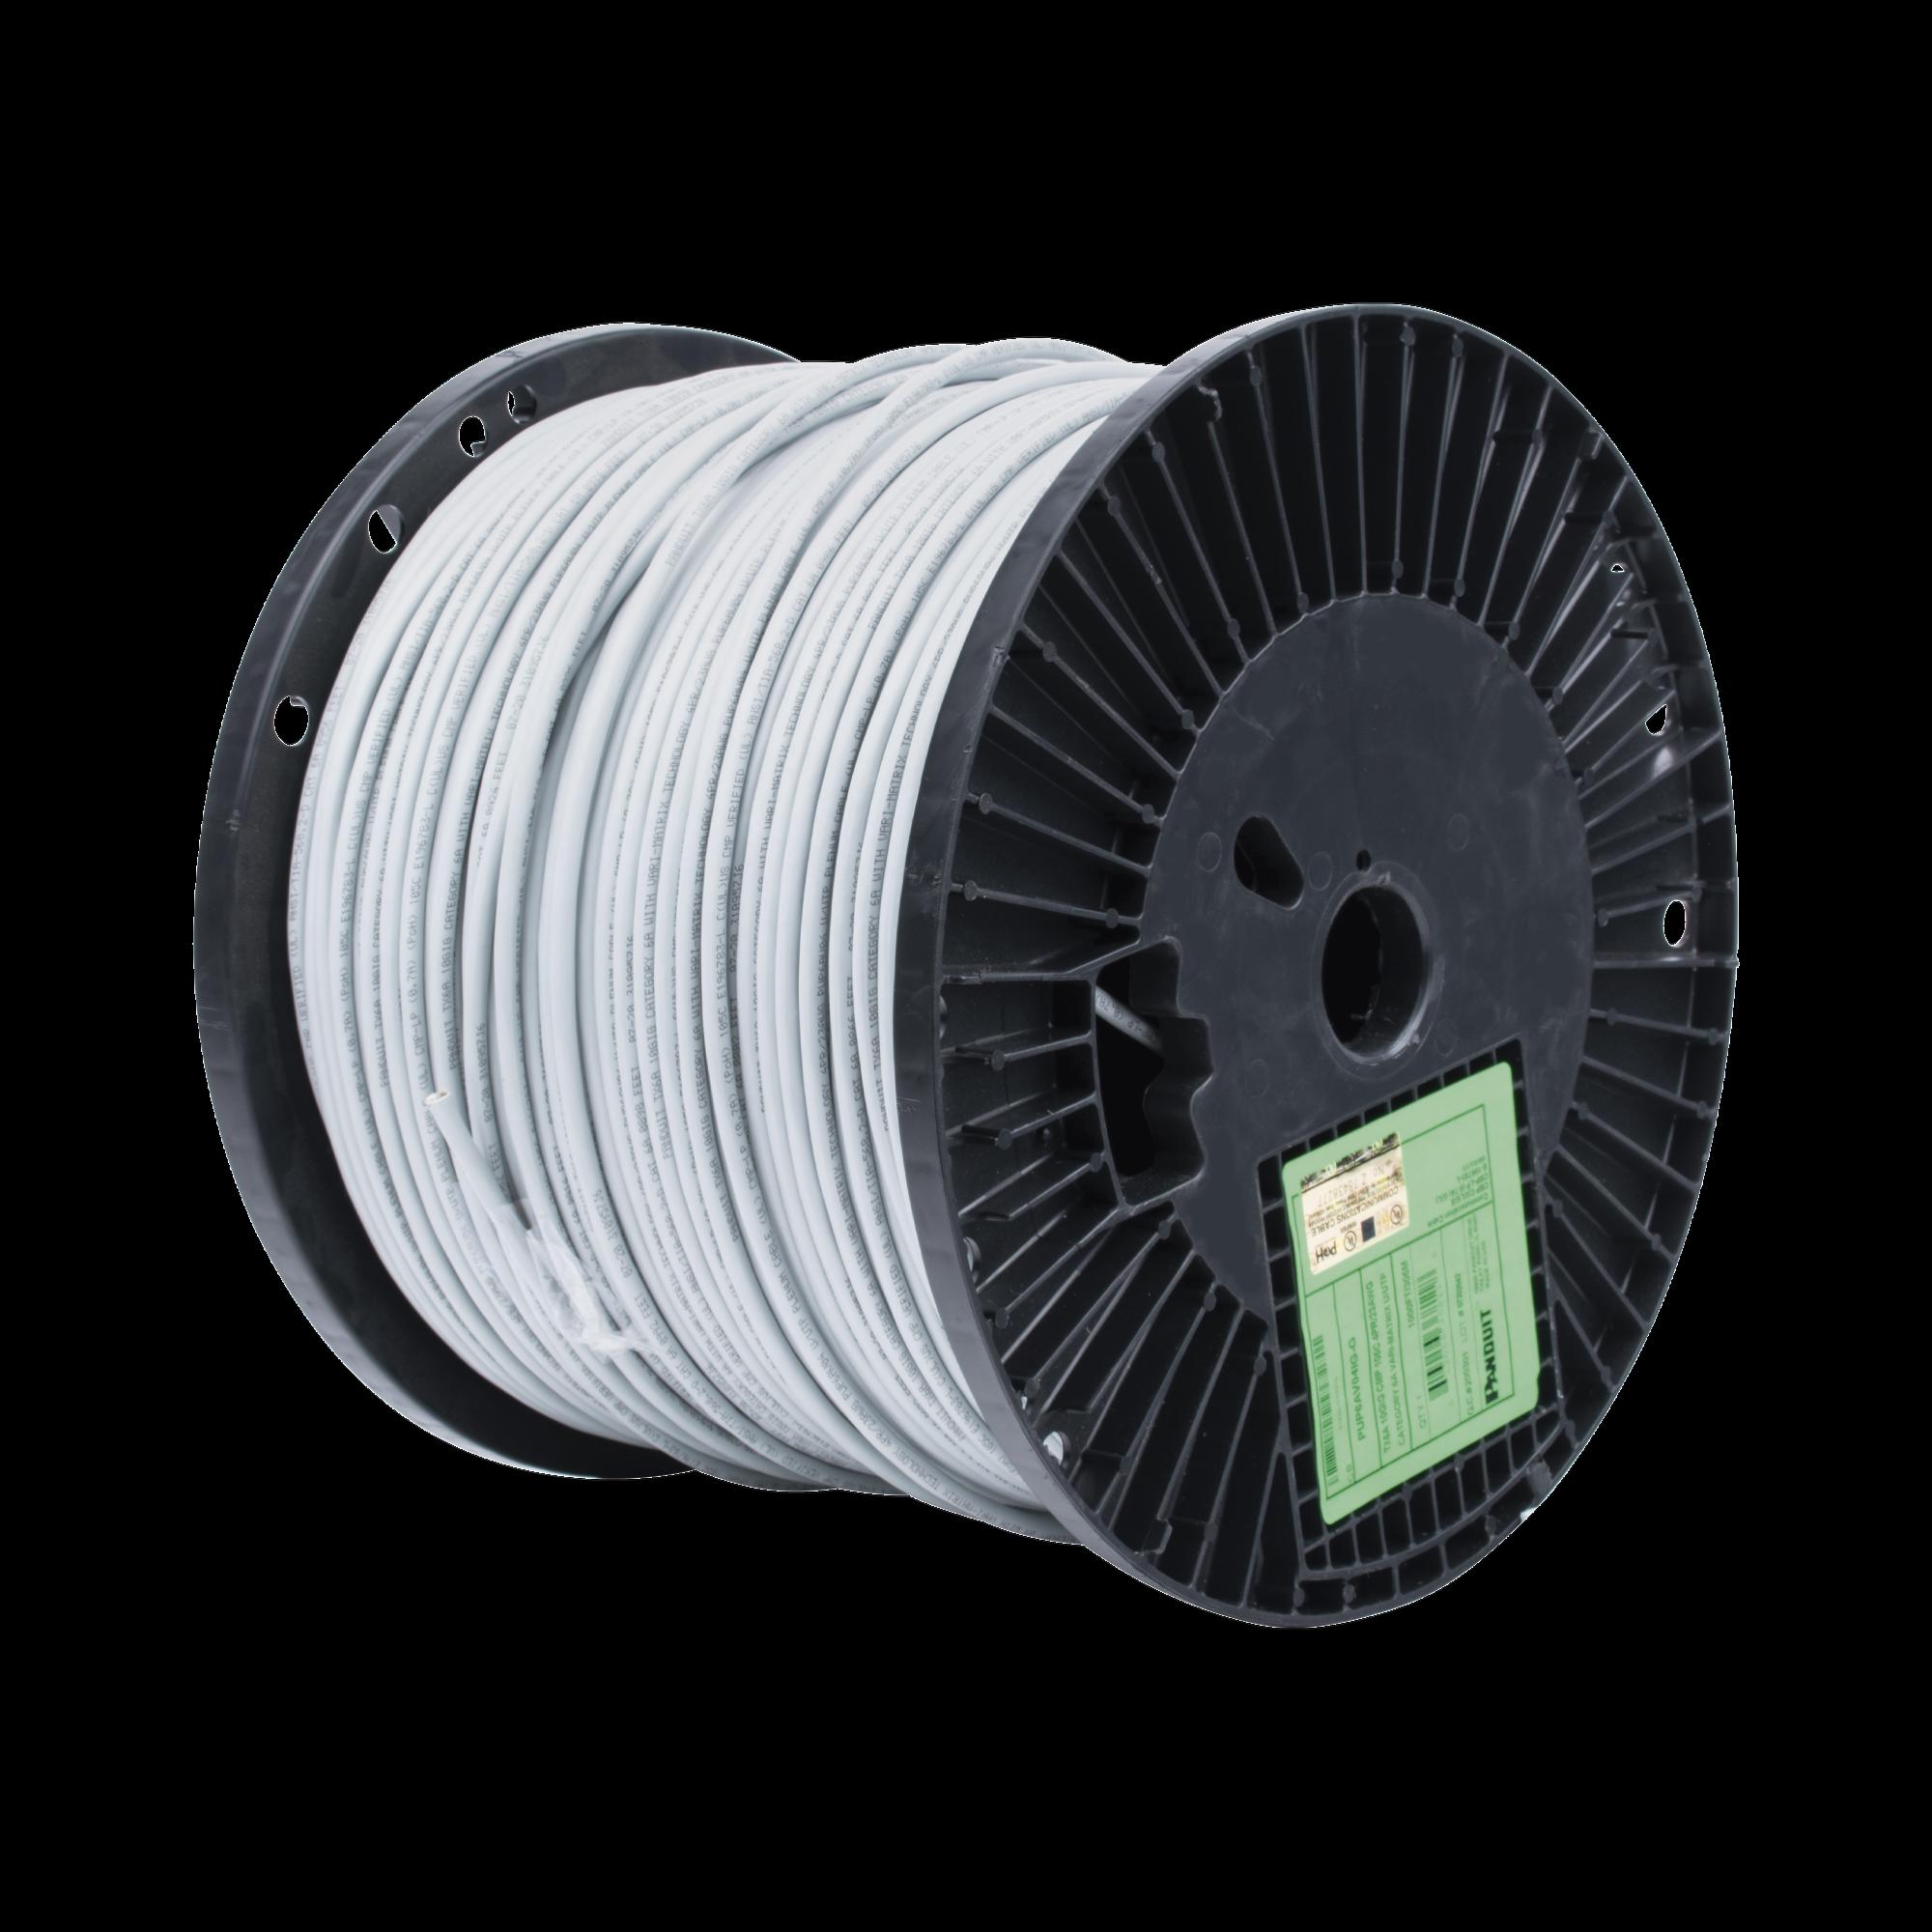 Bobina de Cable UTP de 4 Pares, Vari-MaTriX, Cat6A, 23 AWG, CMP (Plenum), Color Gris, 305m